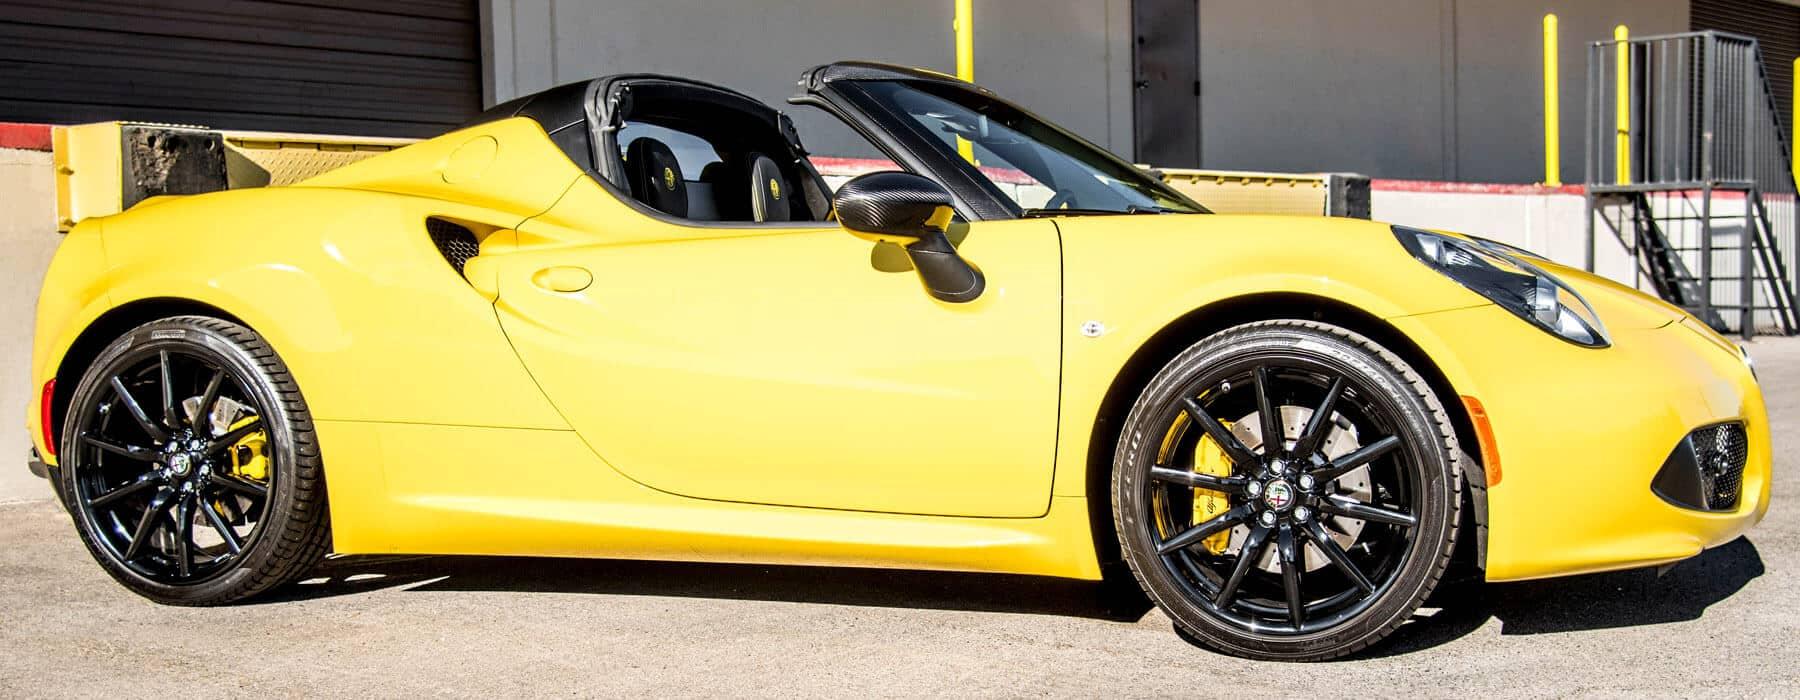 Budget for 1way rental car  LV  Anaheim   Las Vegas